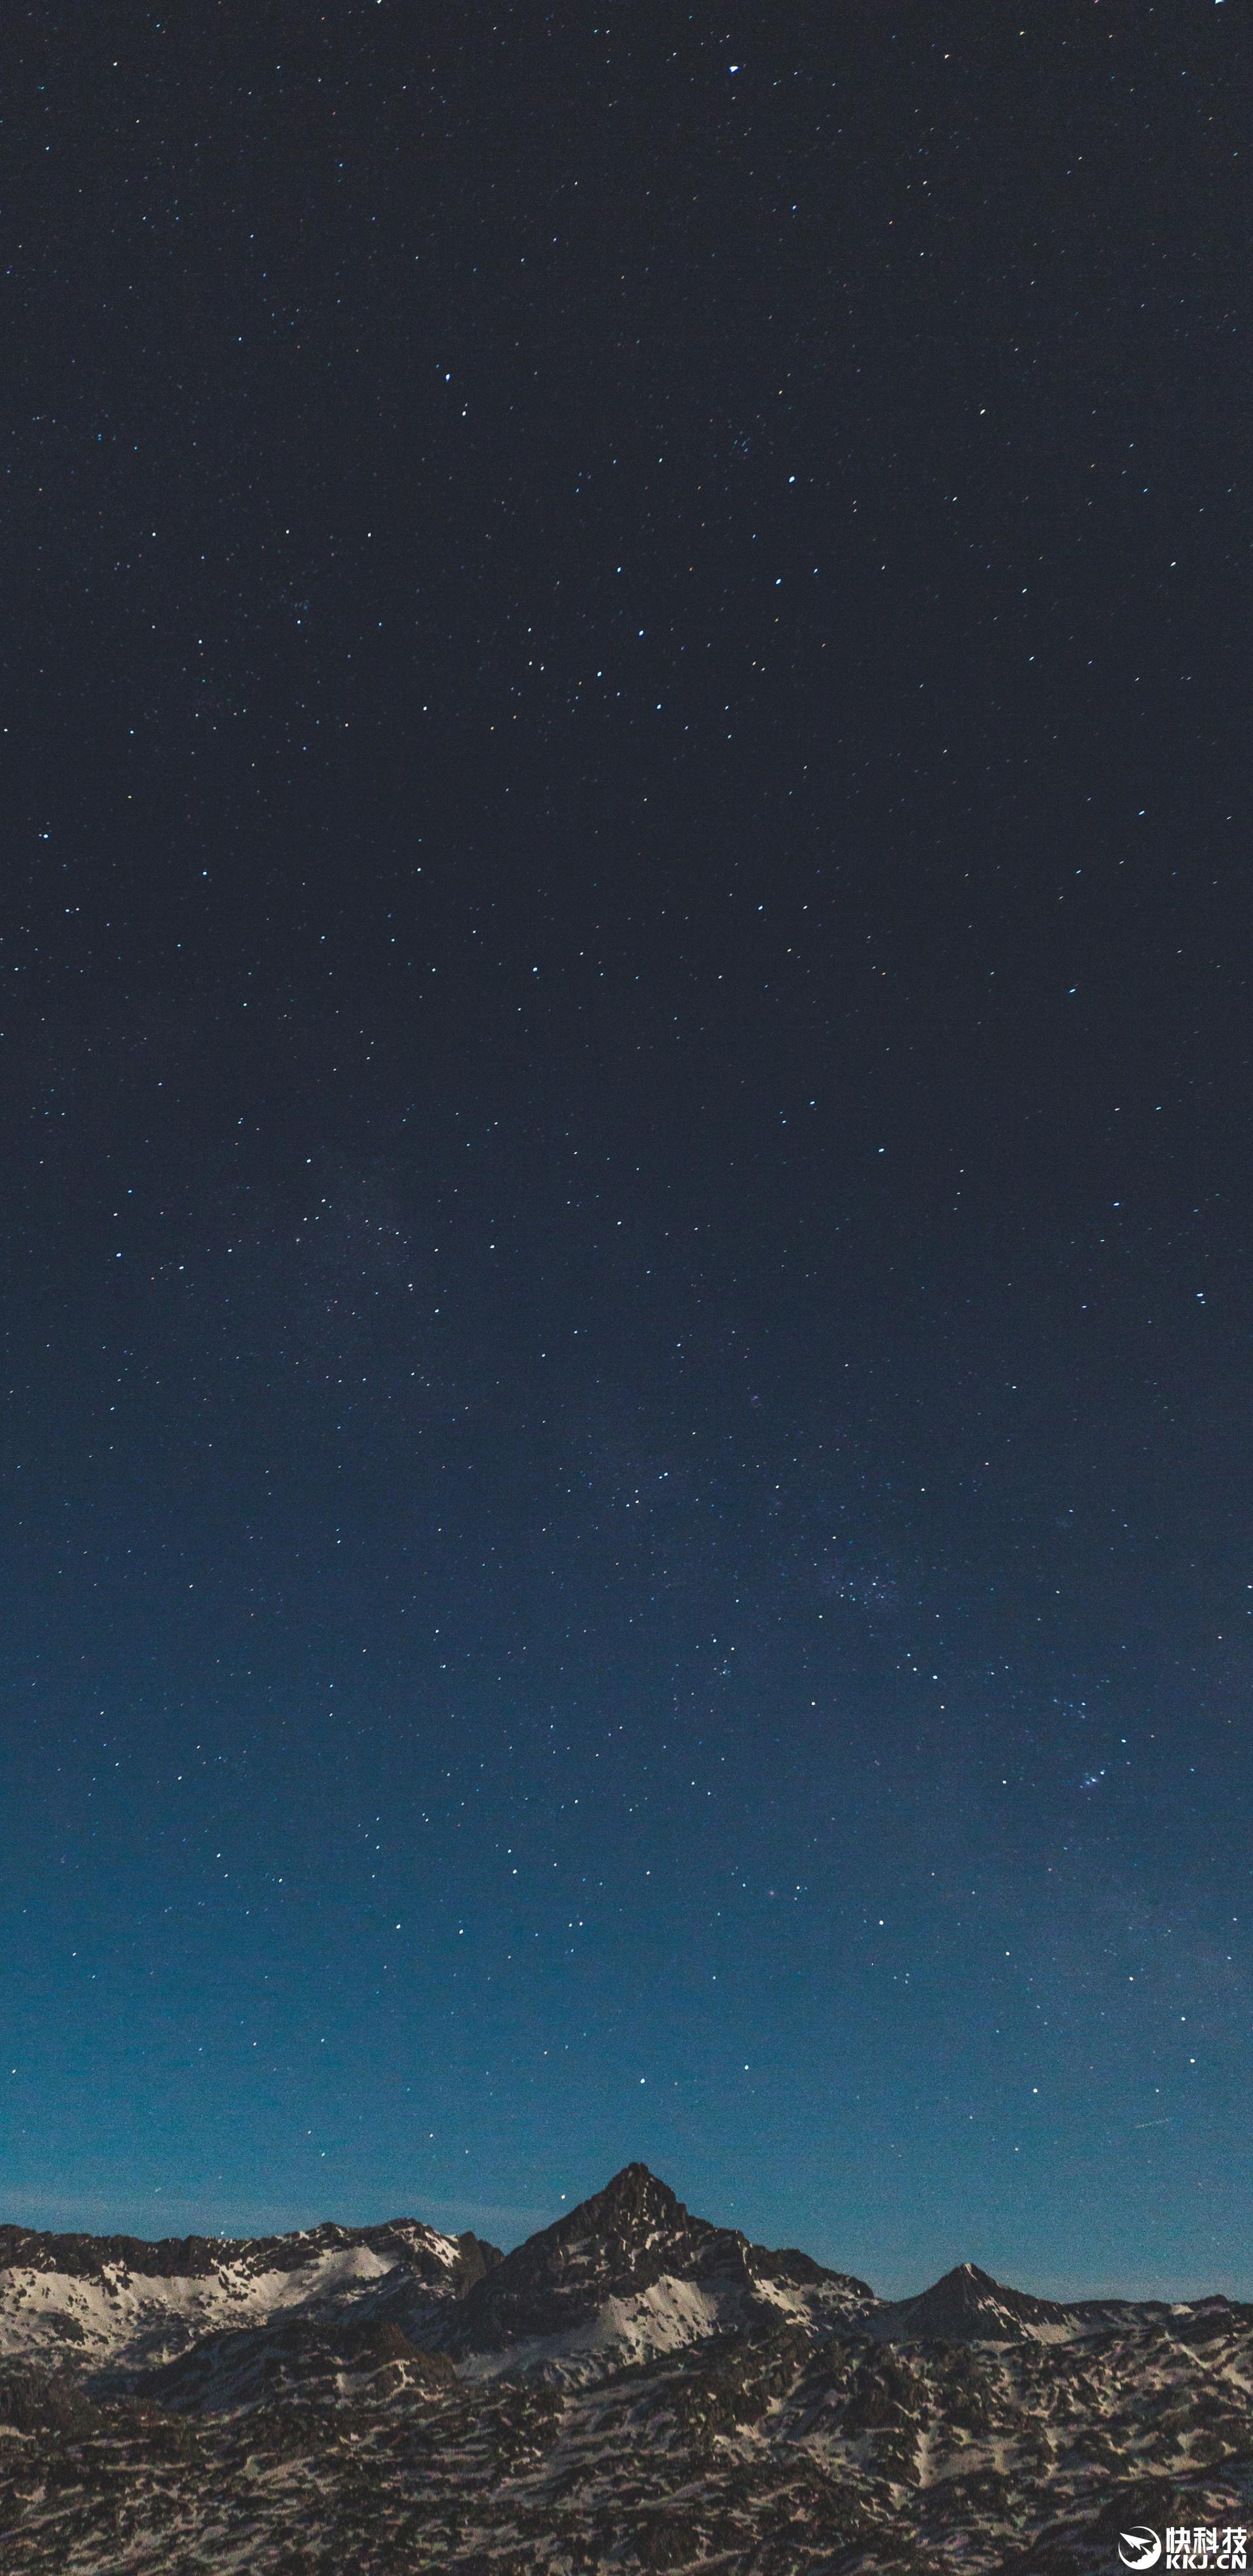 S8 18 9 13 - Wallpaper of galaxy s8 ...